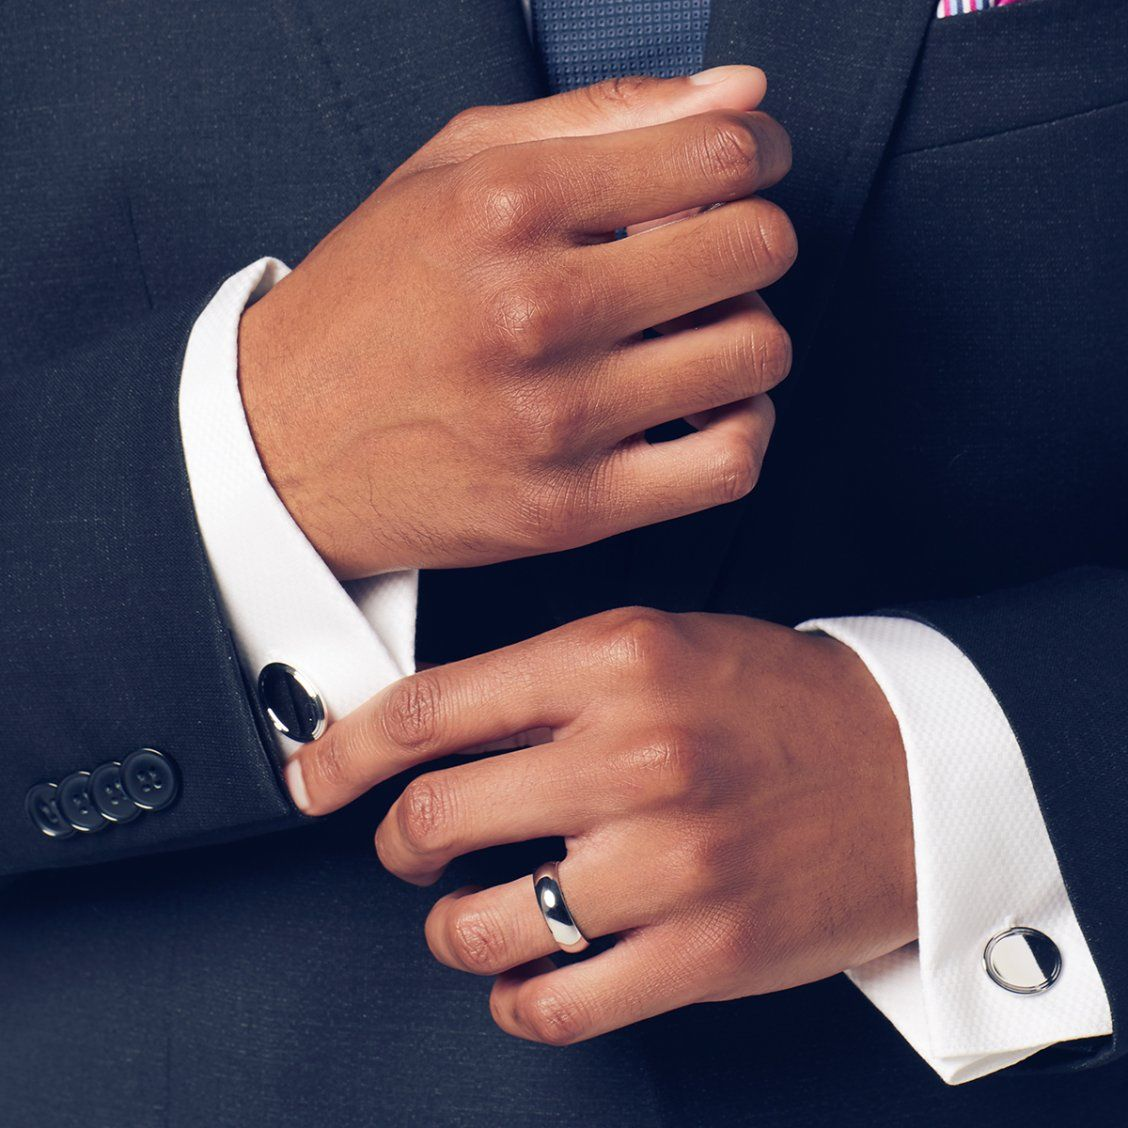 Comfort Fit Wedding Ring In Platinum 6mm Blue Nile Comfort Fit Wedding Ring Blue Nile Wedding Band Comfort Fit